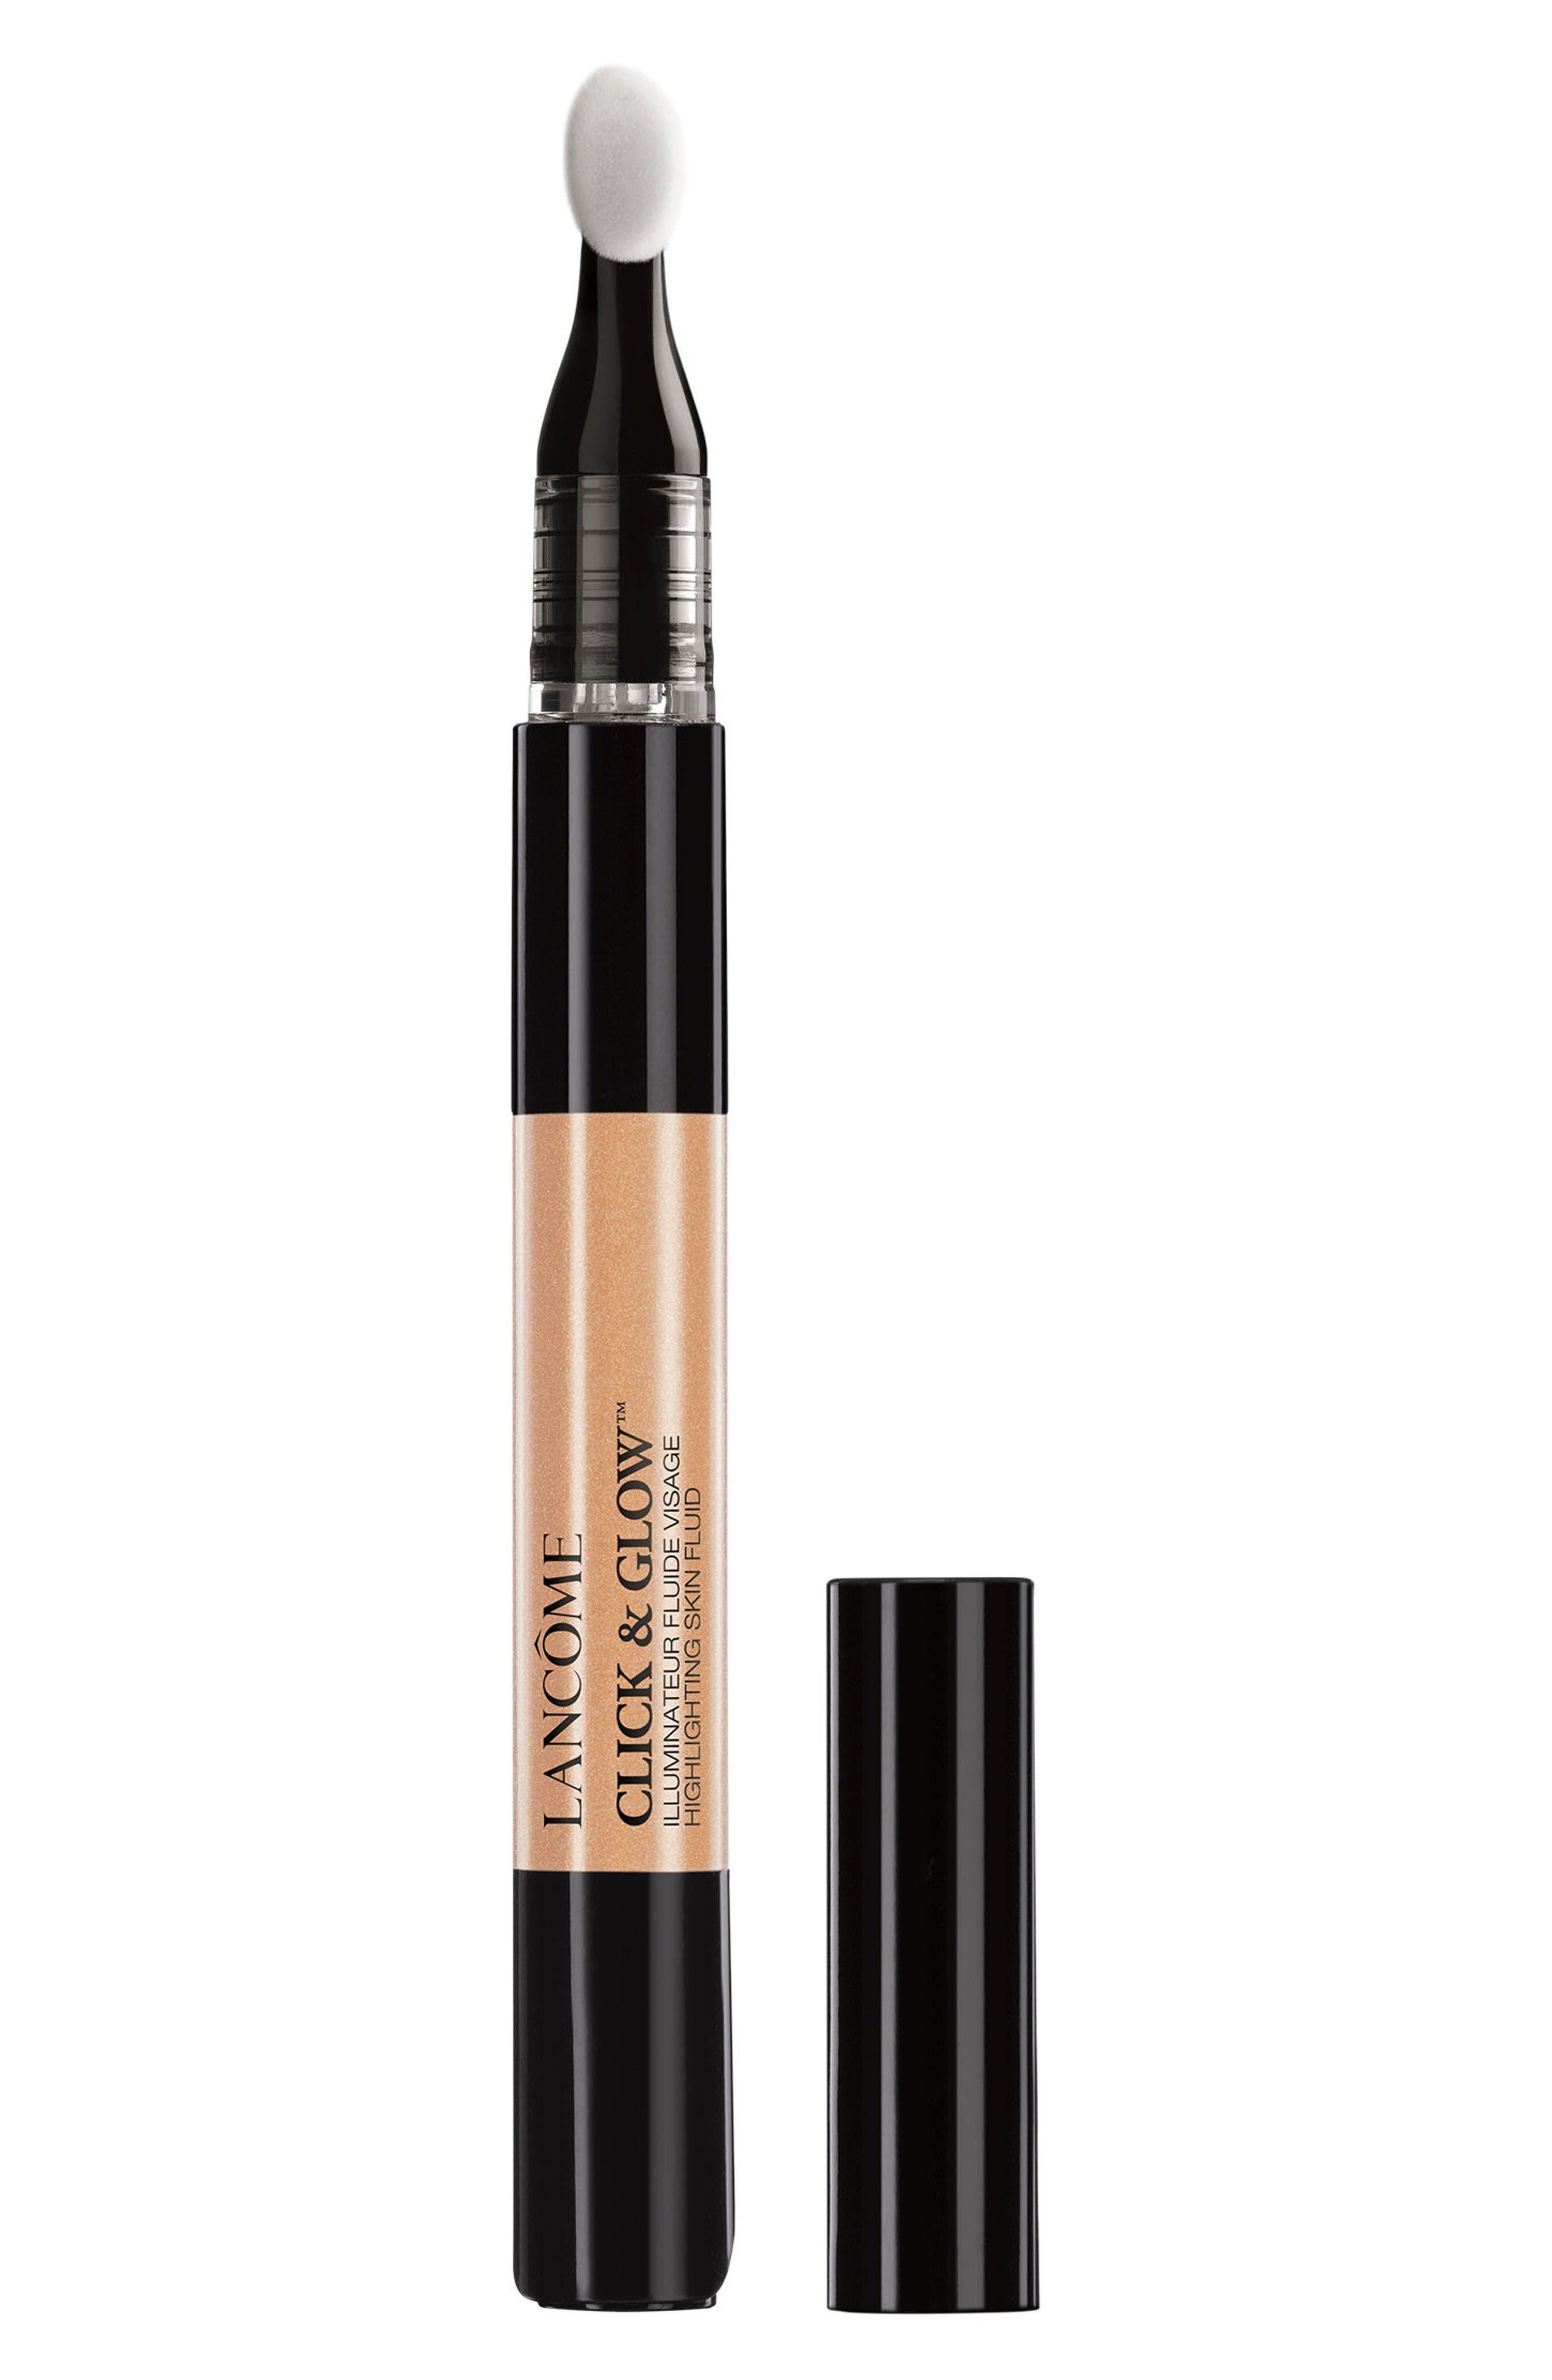 Lancôme Click & Glow Highlghting Pen